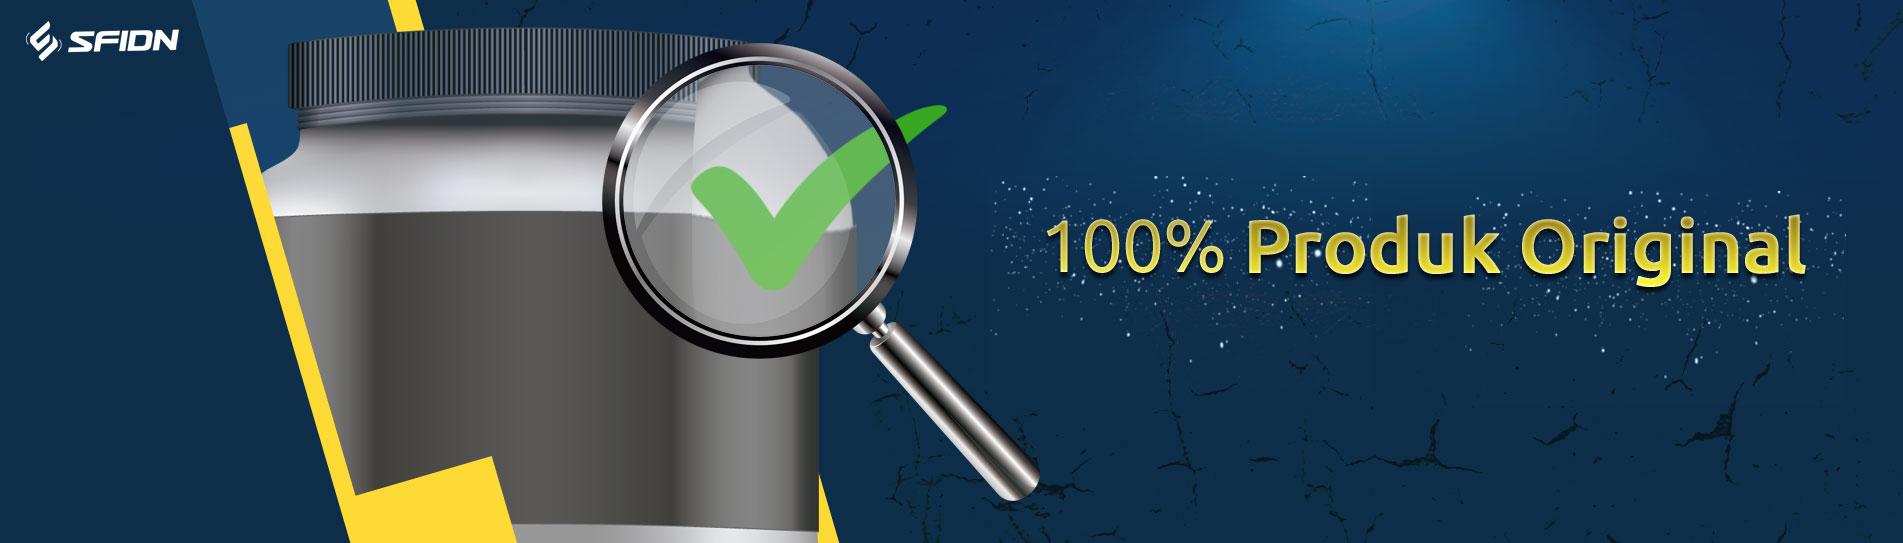 Produk 100% Original SFIDN!